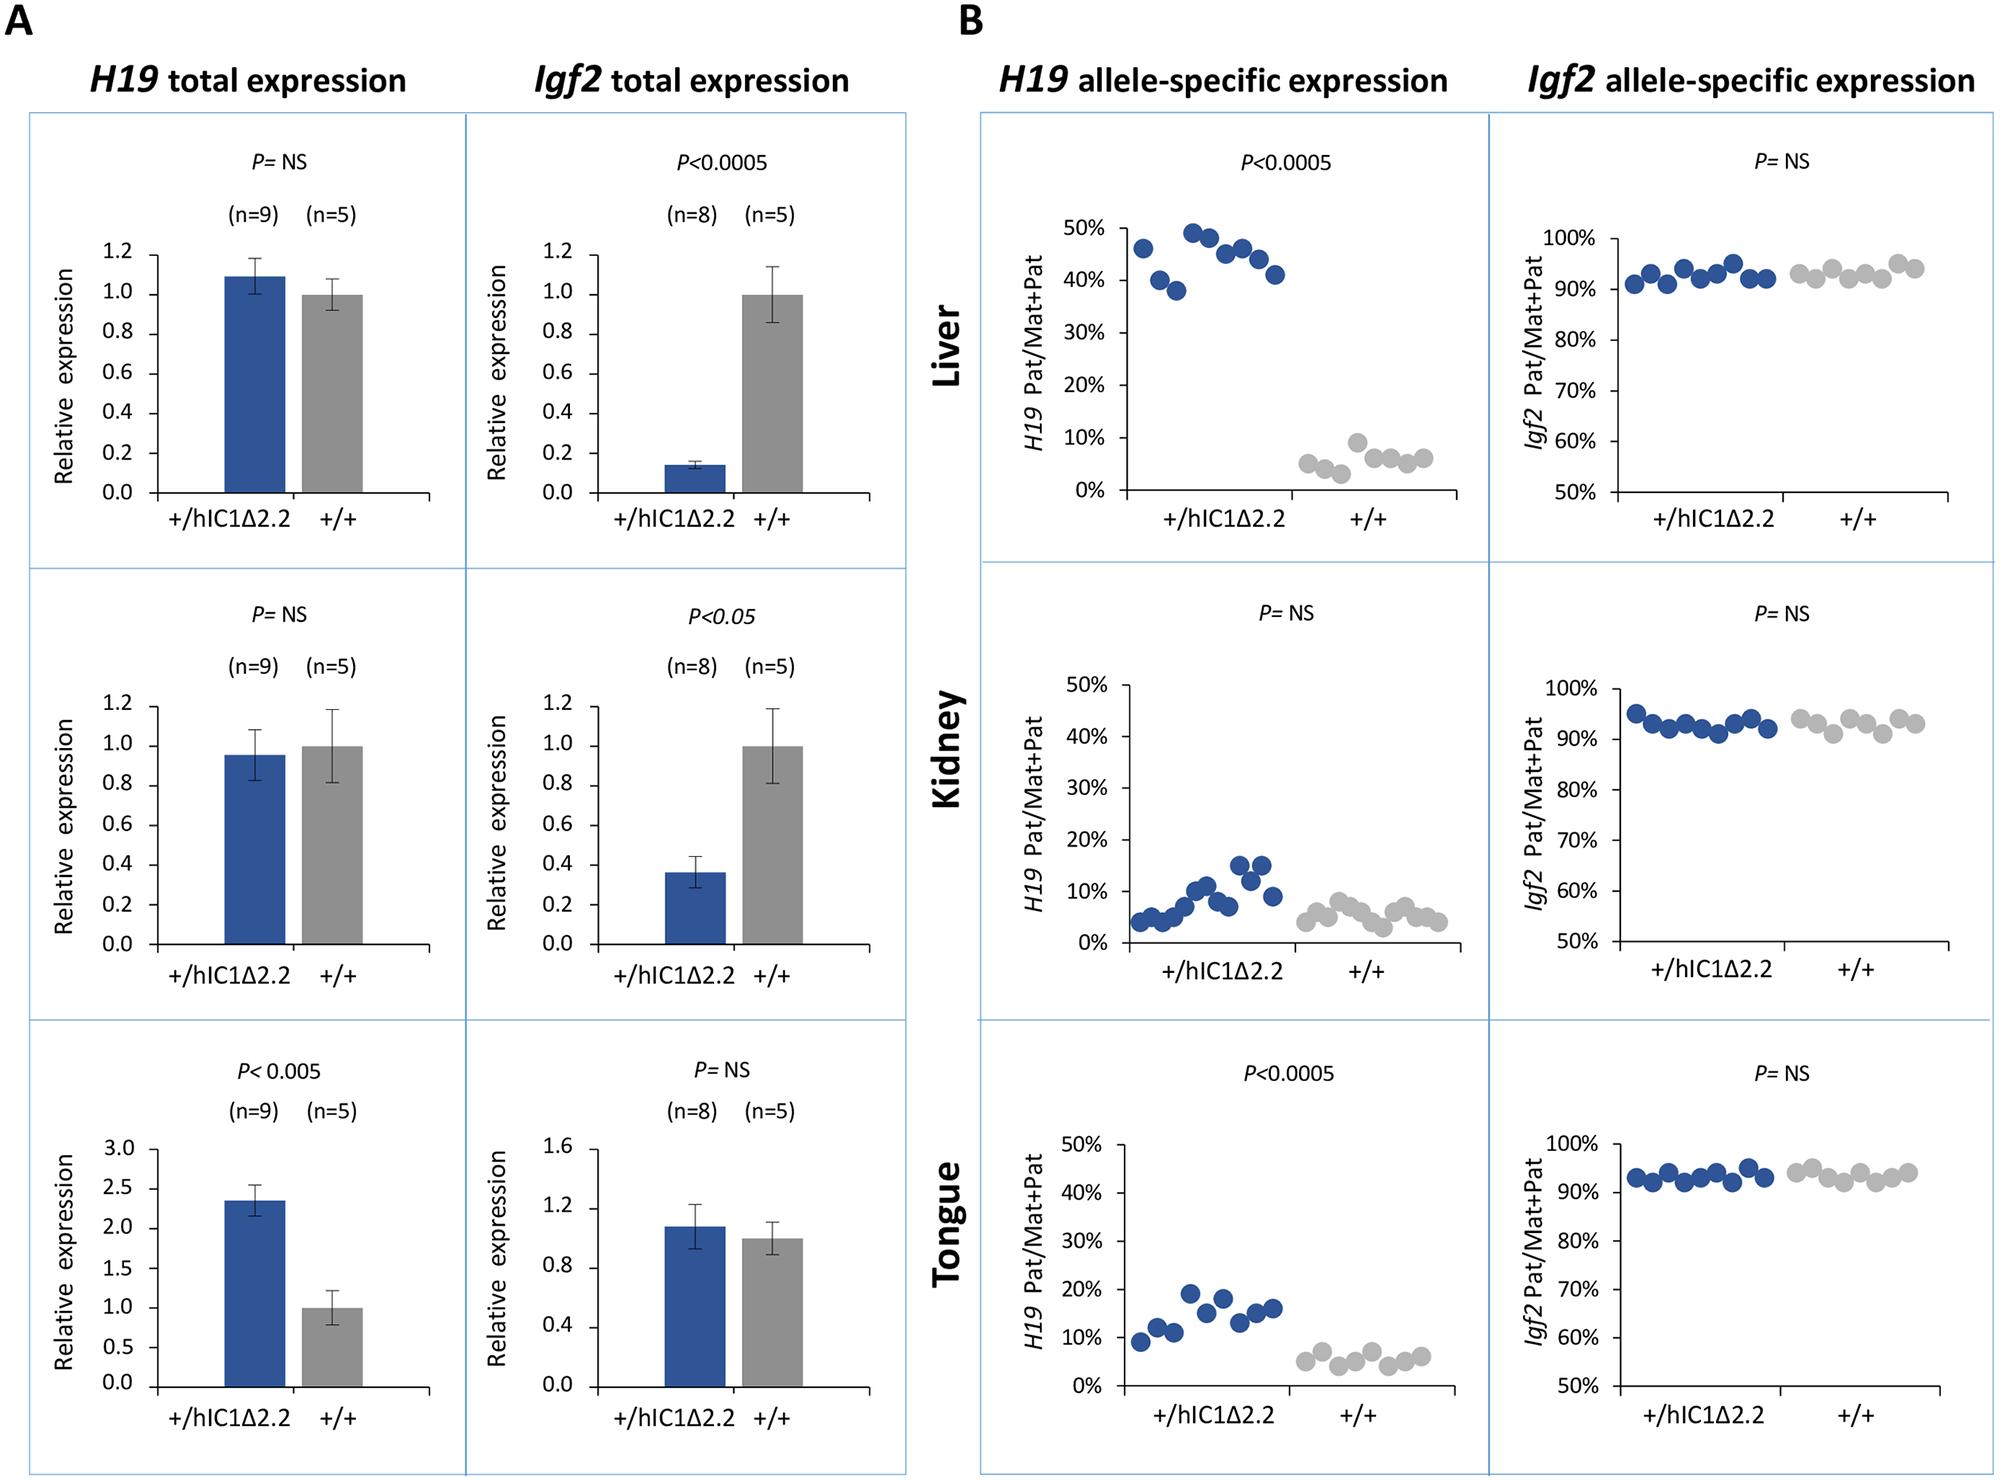 Analysis of <i>H19</i> and <i>Igf2</i> expression in <i>H19</i><sup><i>+/hIC1</i>Δ<i>2</i>.<i>2</i></sup> newborn mice.